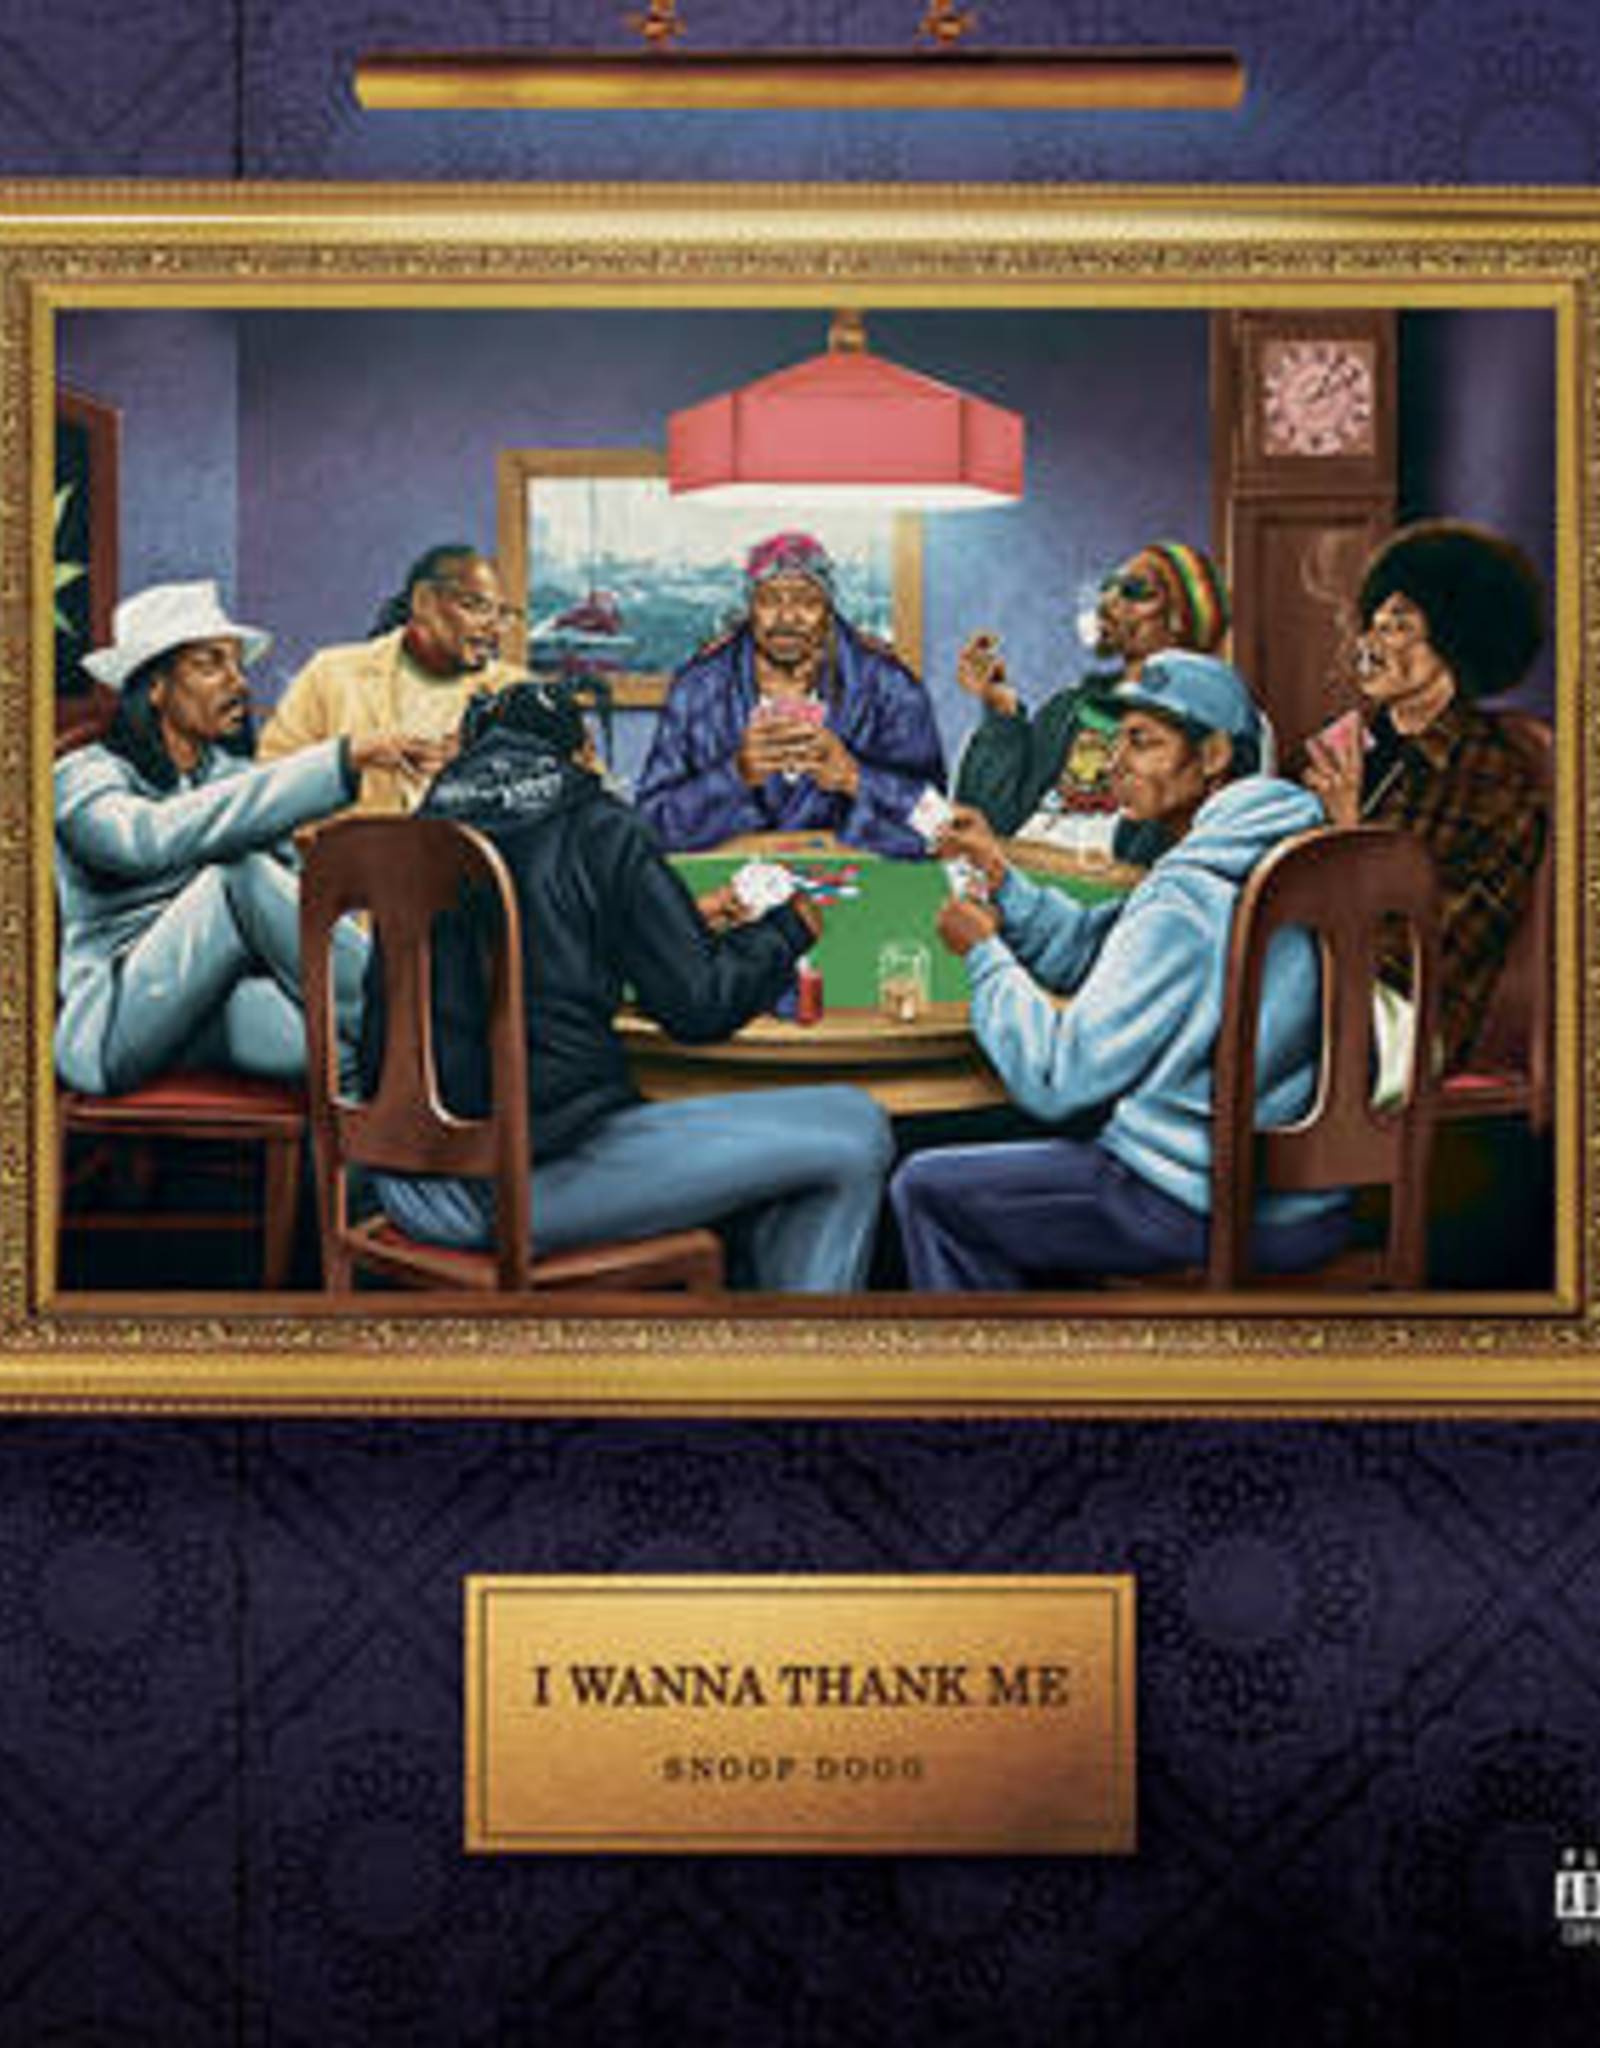 Snoop Dogg - I Wanna Thank Me  (RSD 2020)